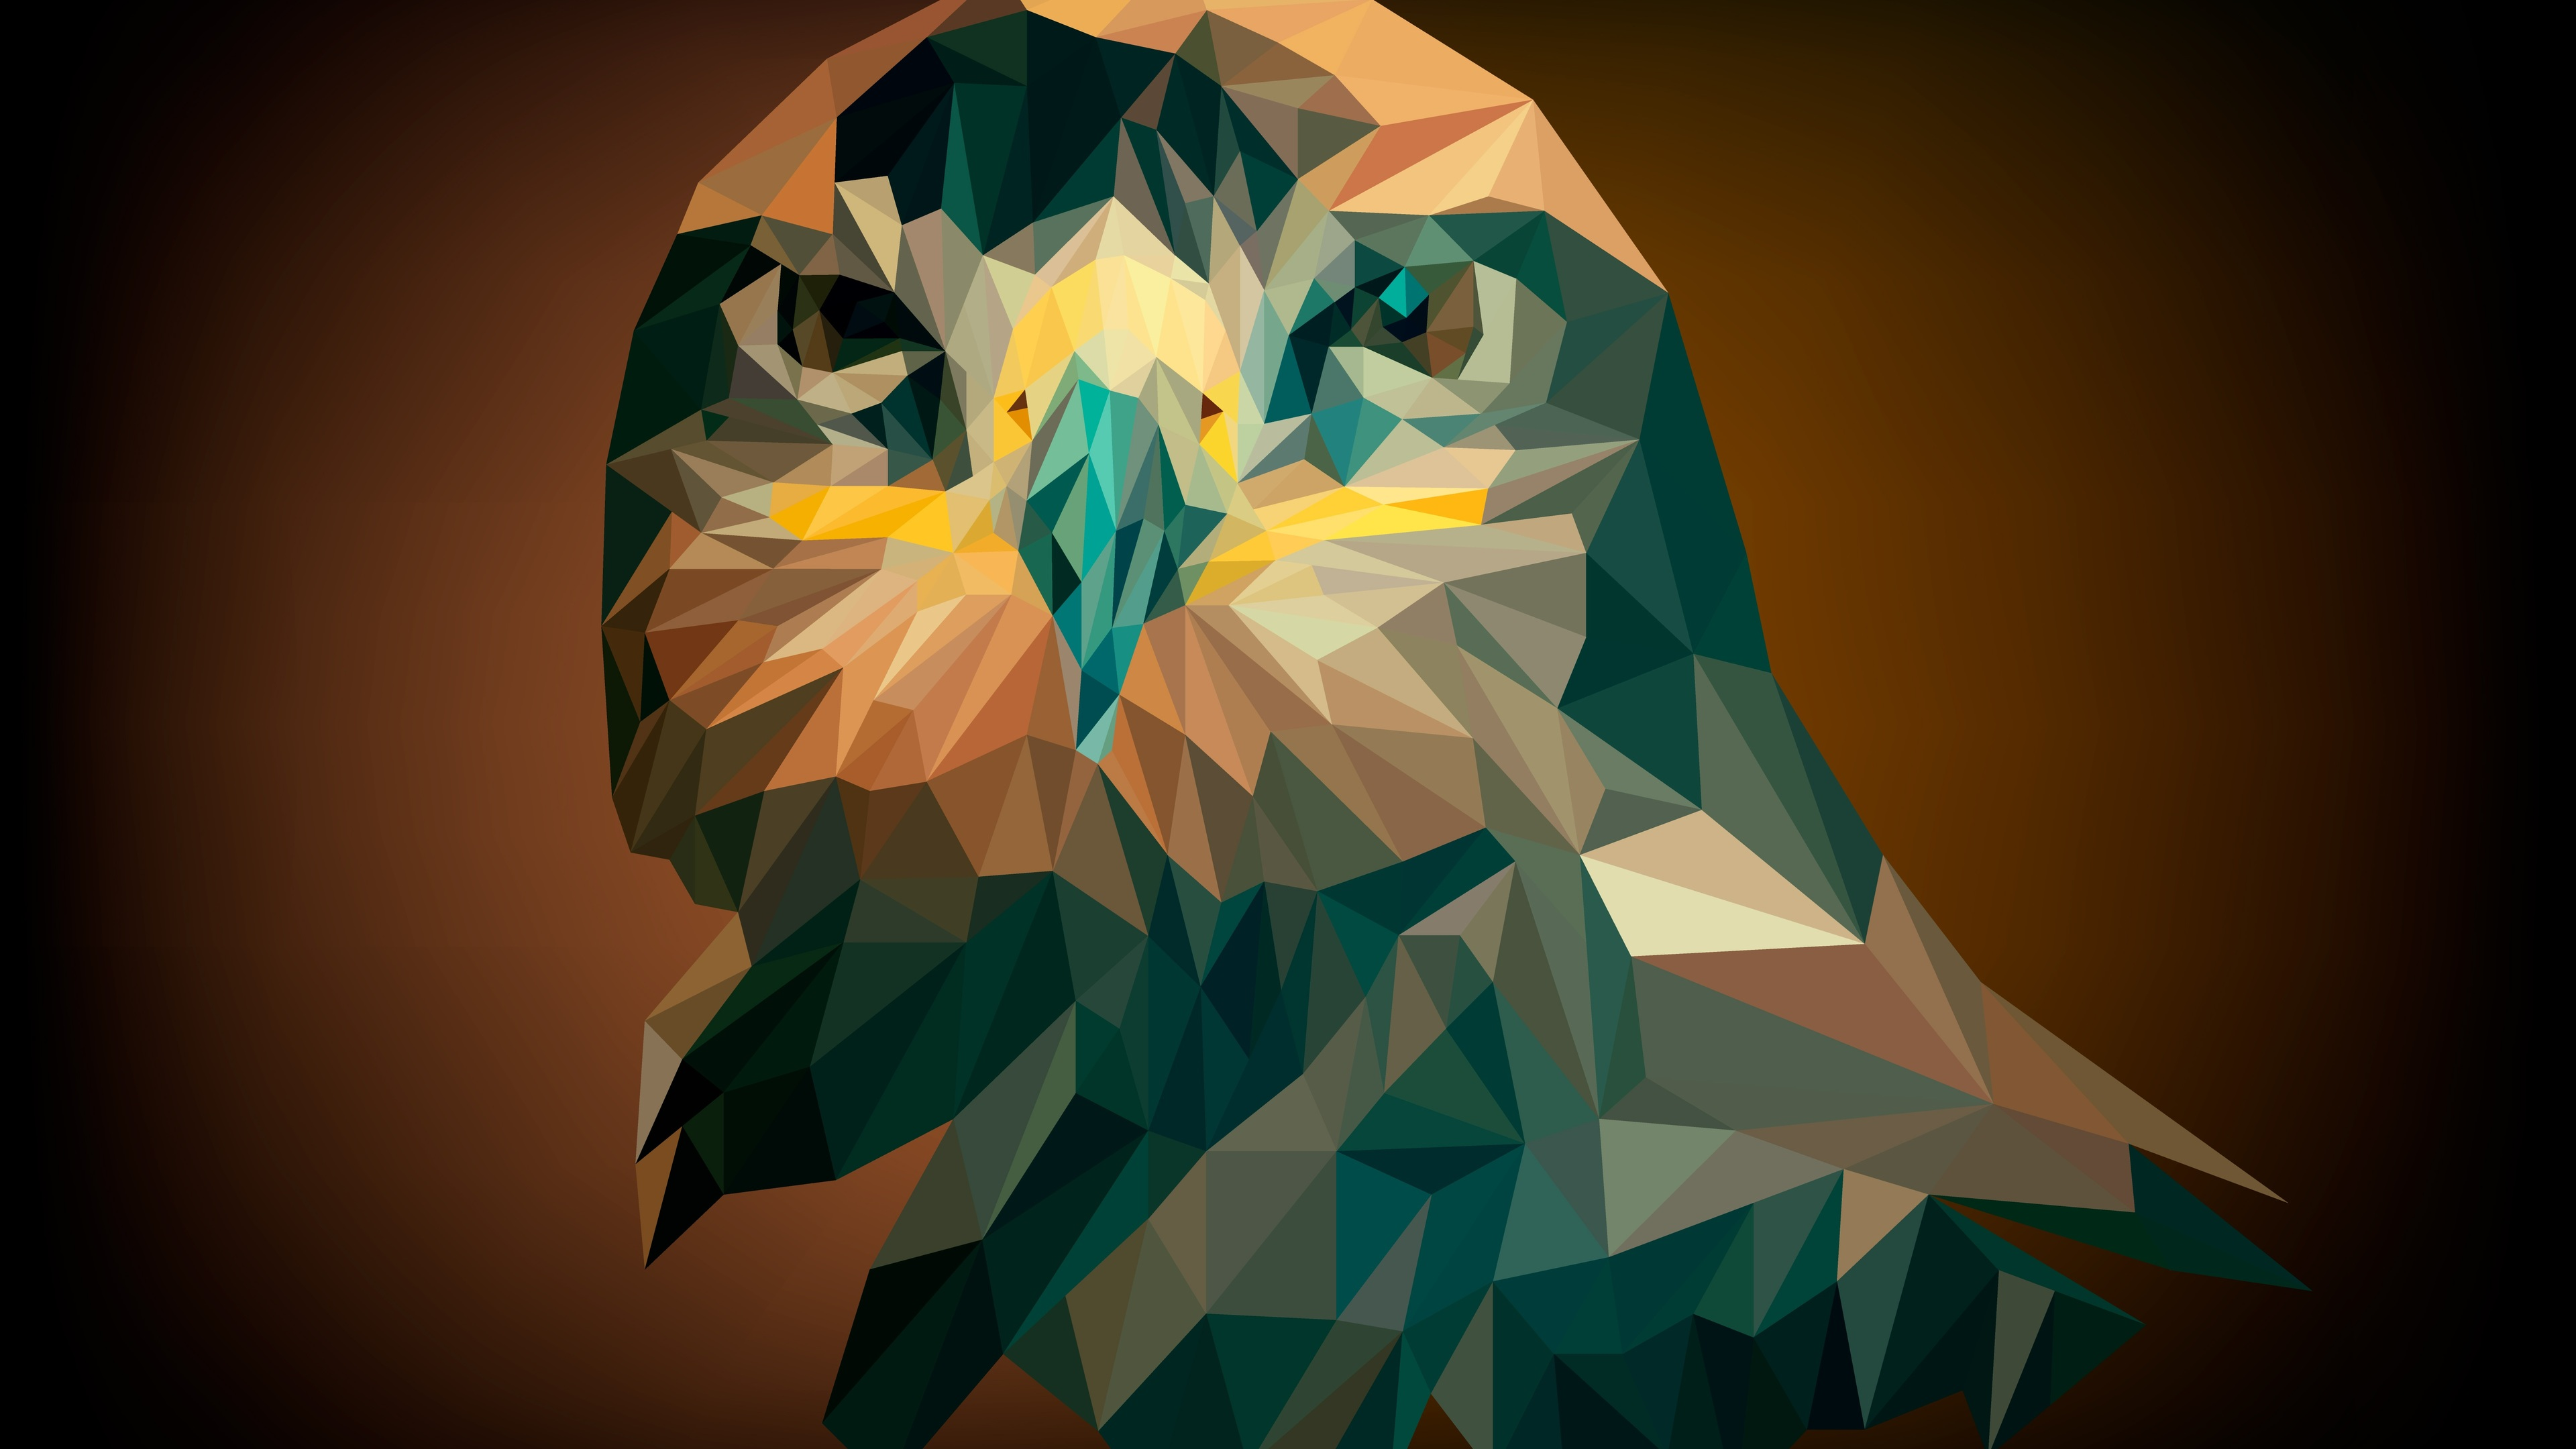 artistic abstract owl 1539371204 - Artistic Abstract Owl - owl wallpapers, hd-wallpapers, artistic wallpapers, abstract wallpapers, 5k wallpapers, 4k-wallpapers